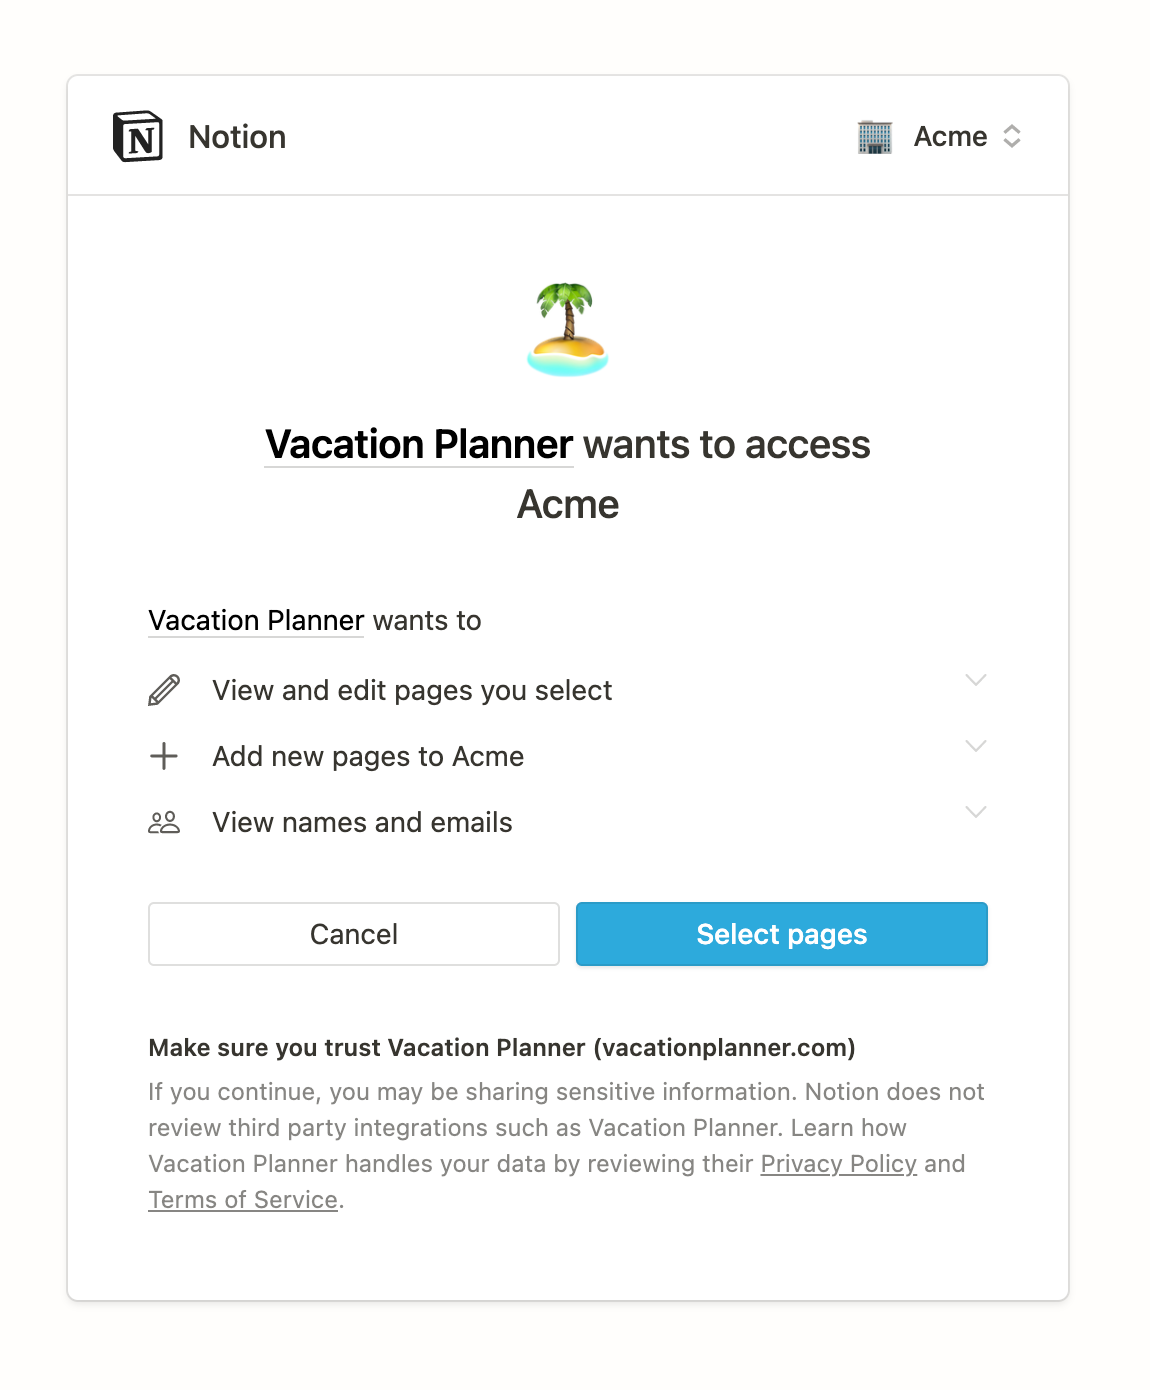 Integration authorization